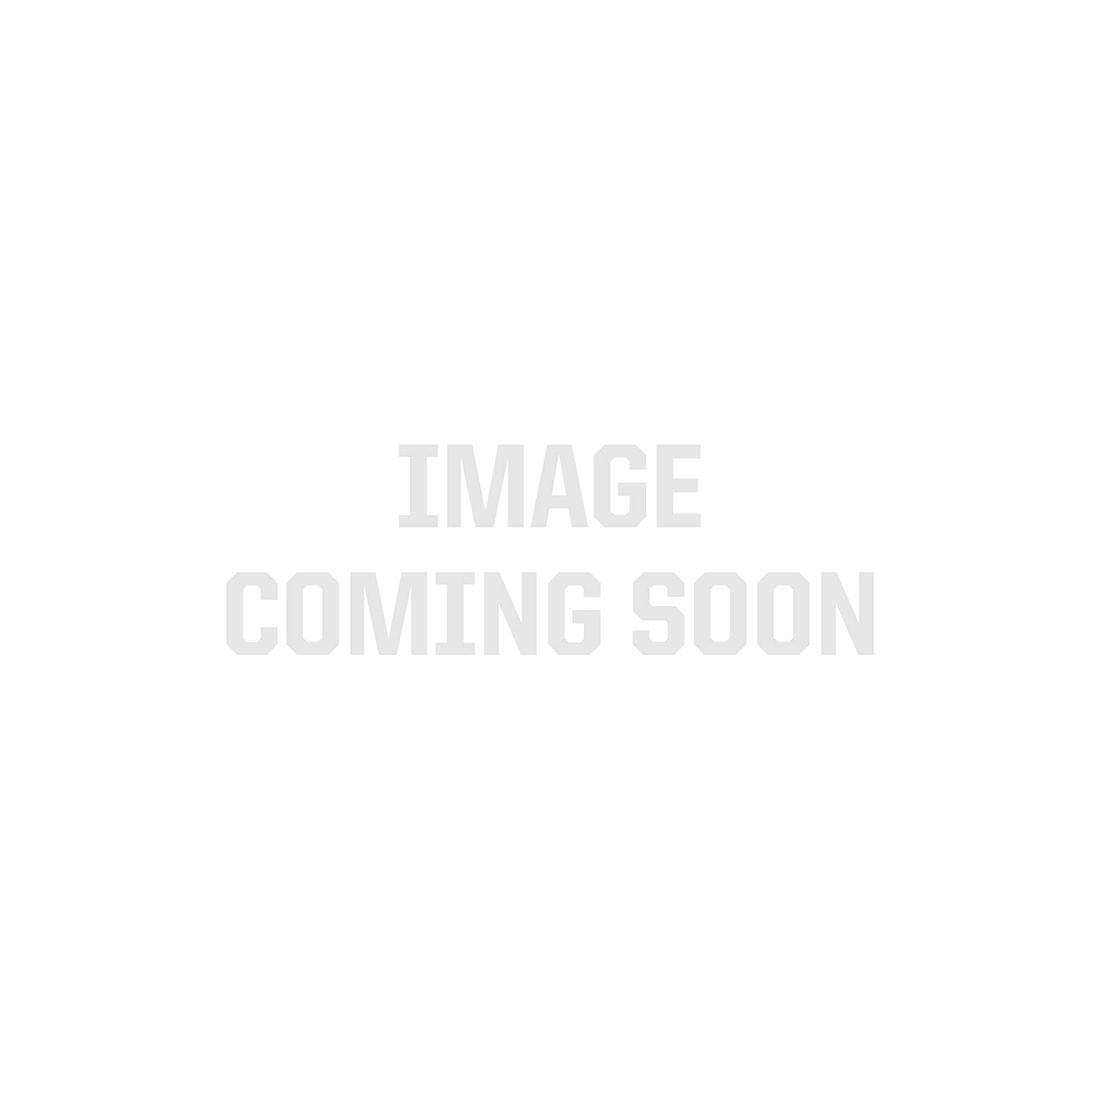 TruColor 2835 LED Strip Light - 3,000K - 80/m - CurrentControl - Sample Kit